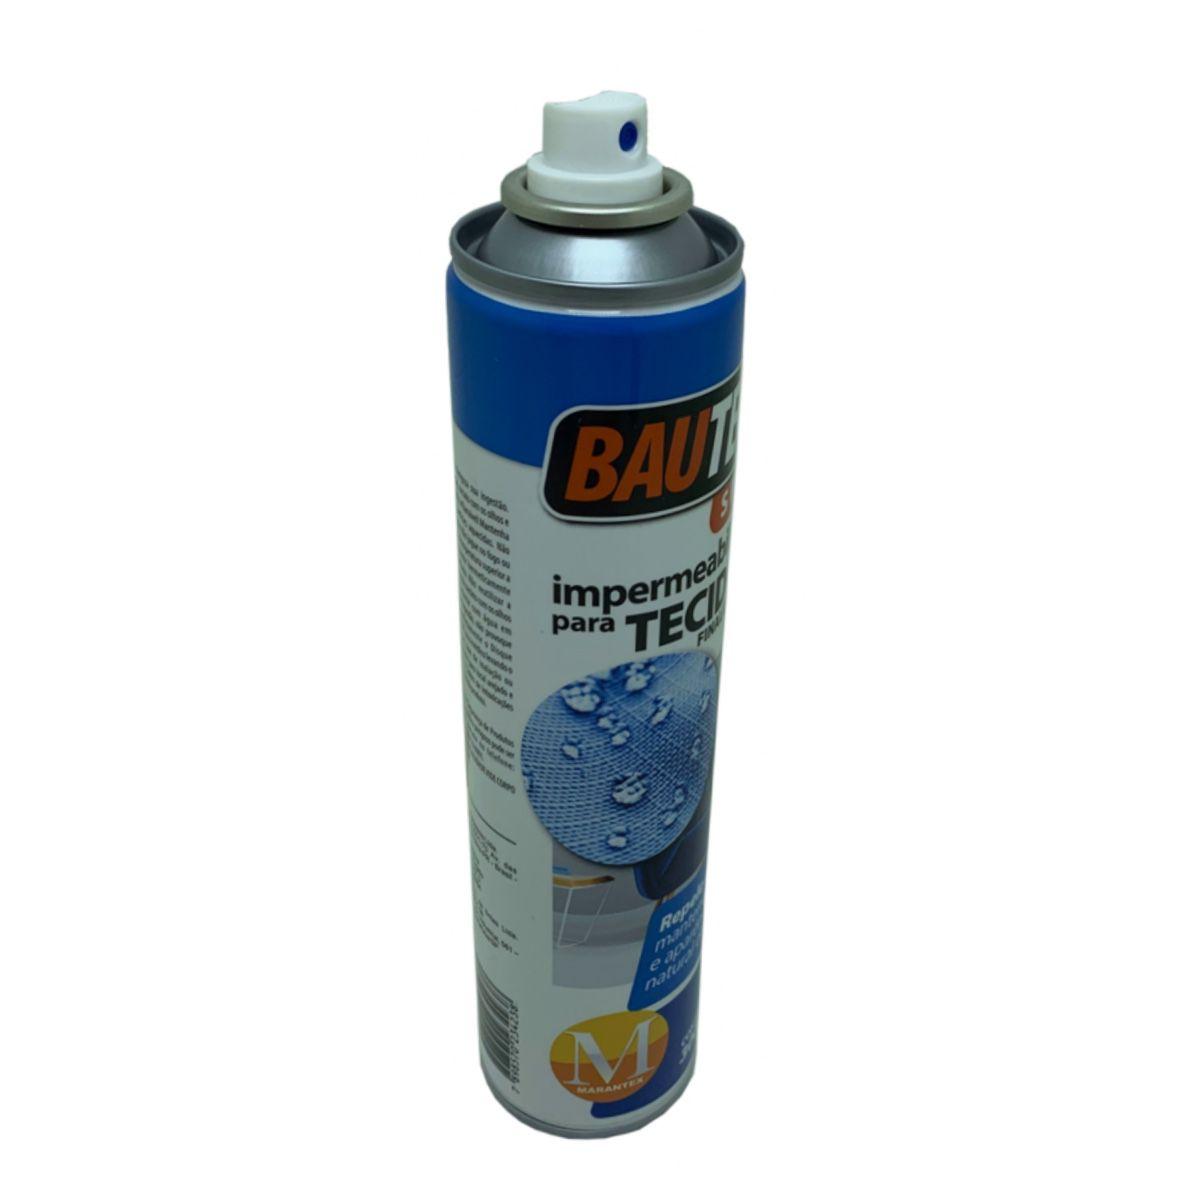 2 UNI Impermeabilizante De Tecido E Estofado Bautech 300ml